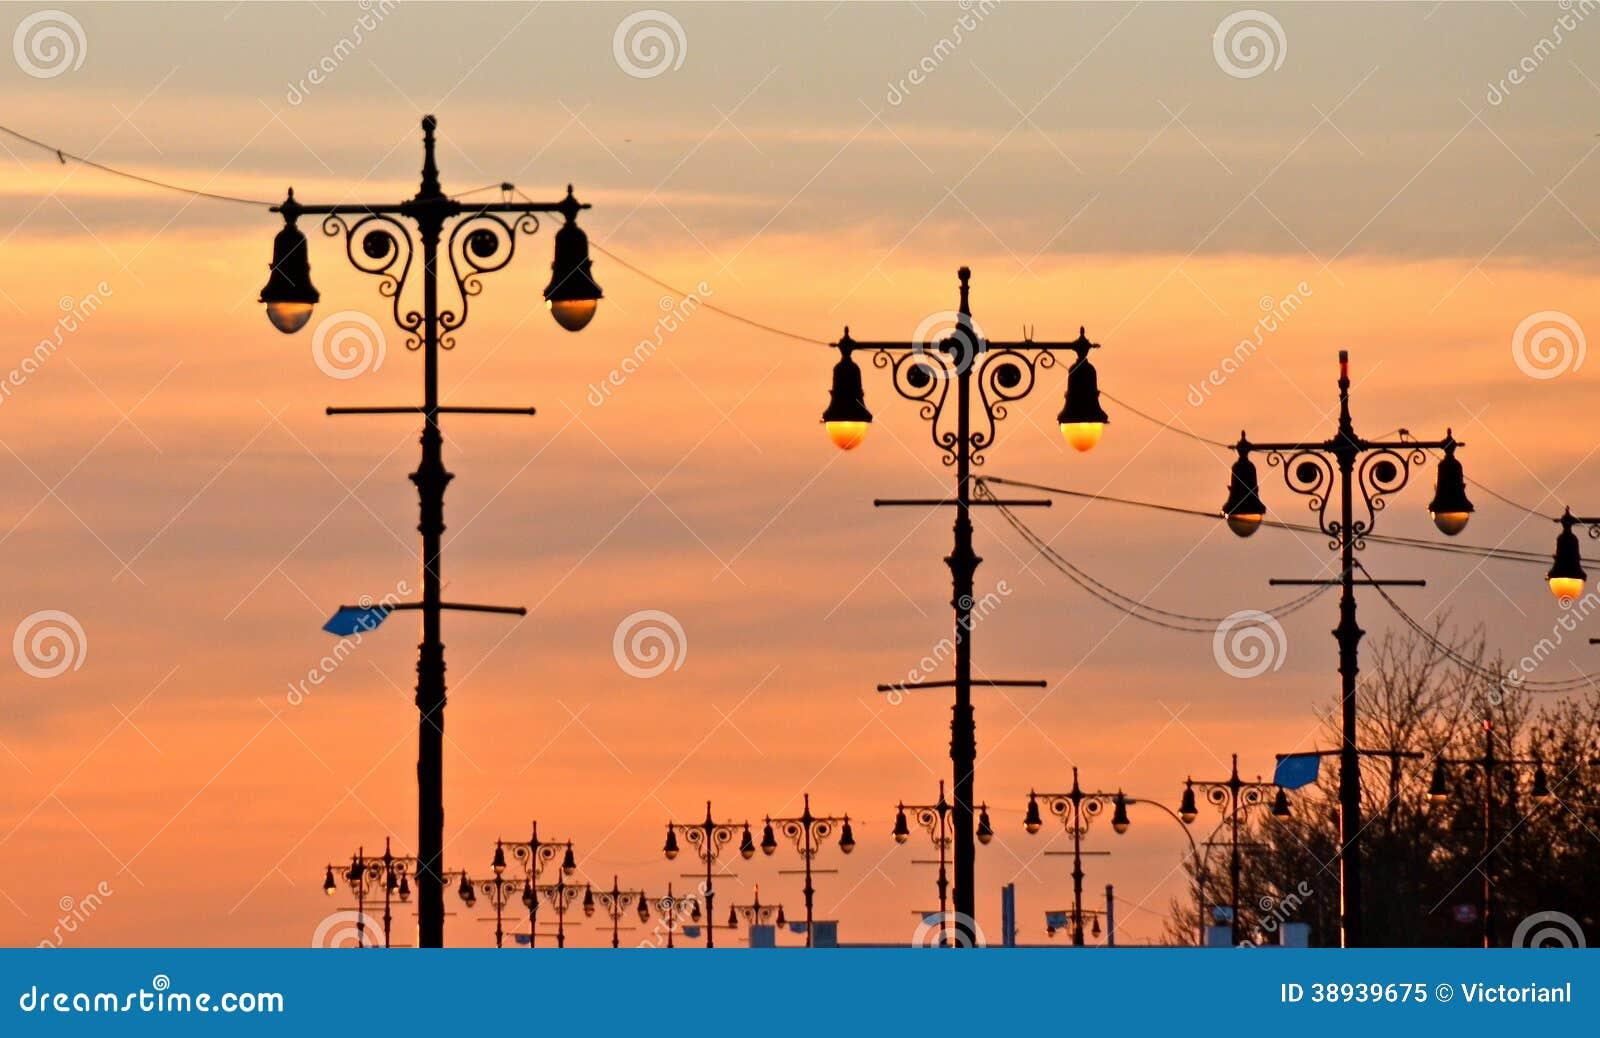 Street lamps of Brighton Beach, New York.